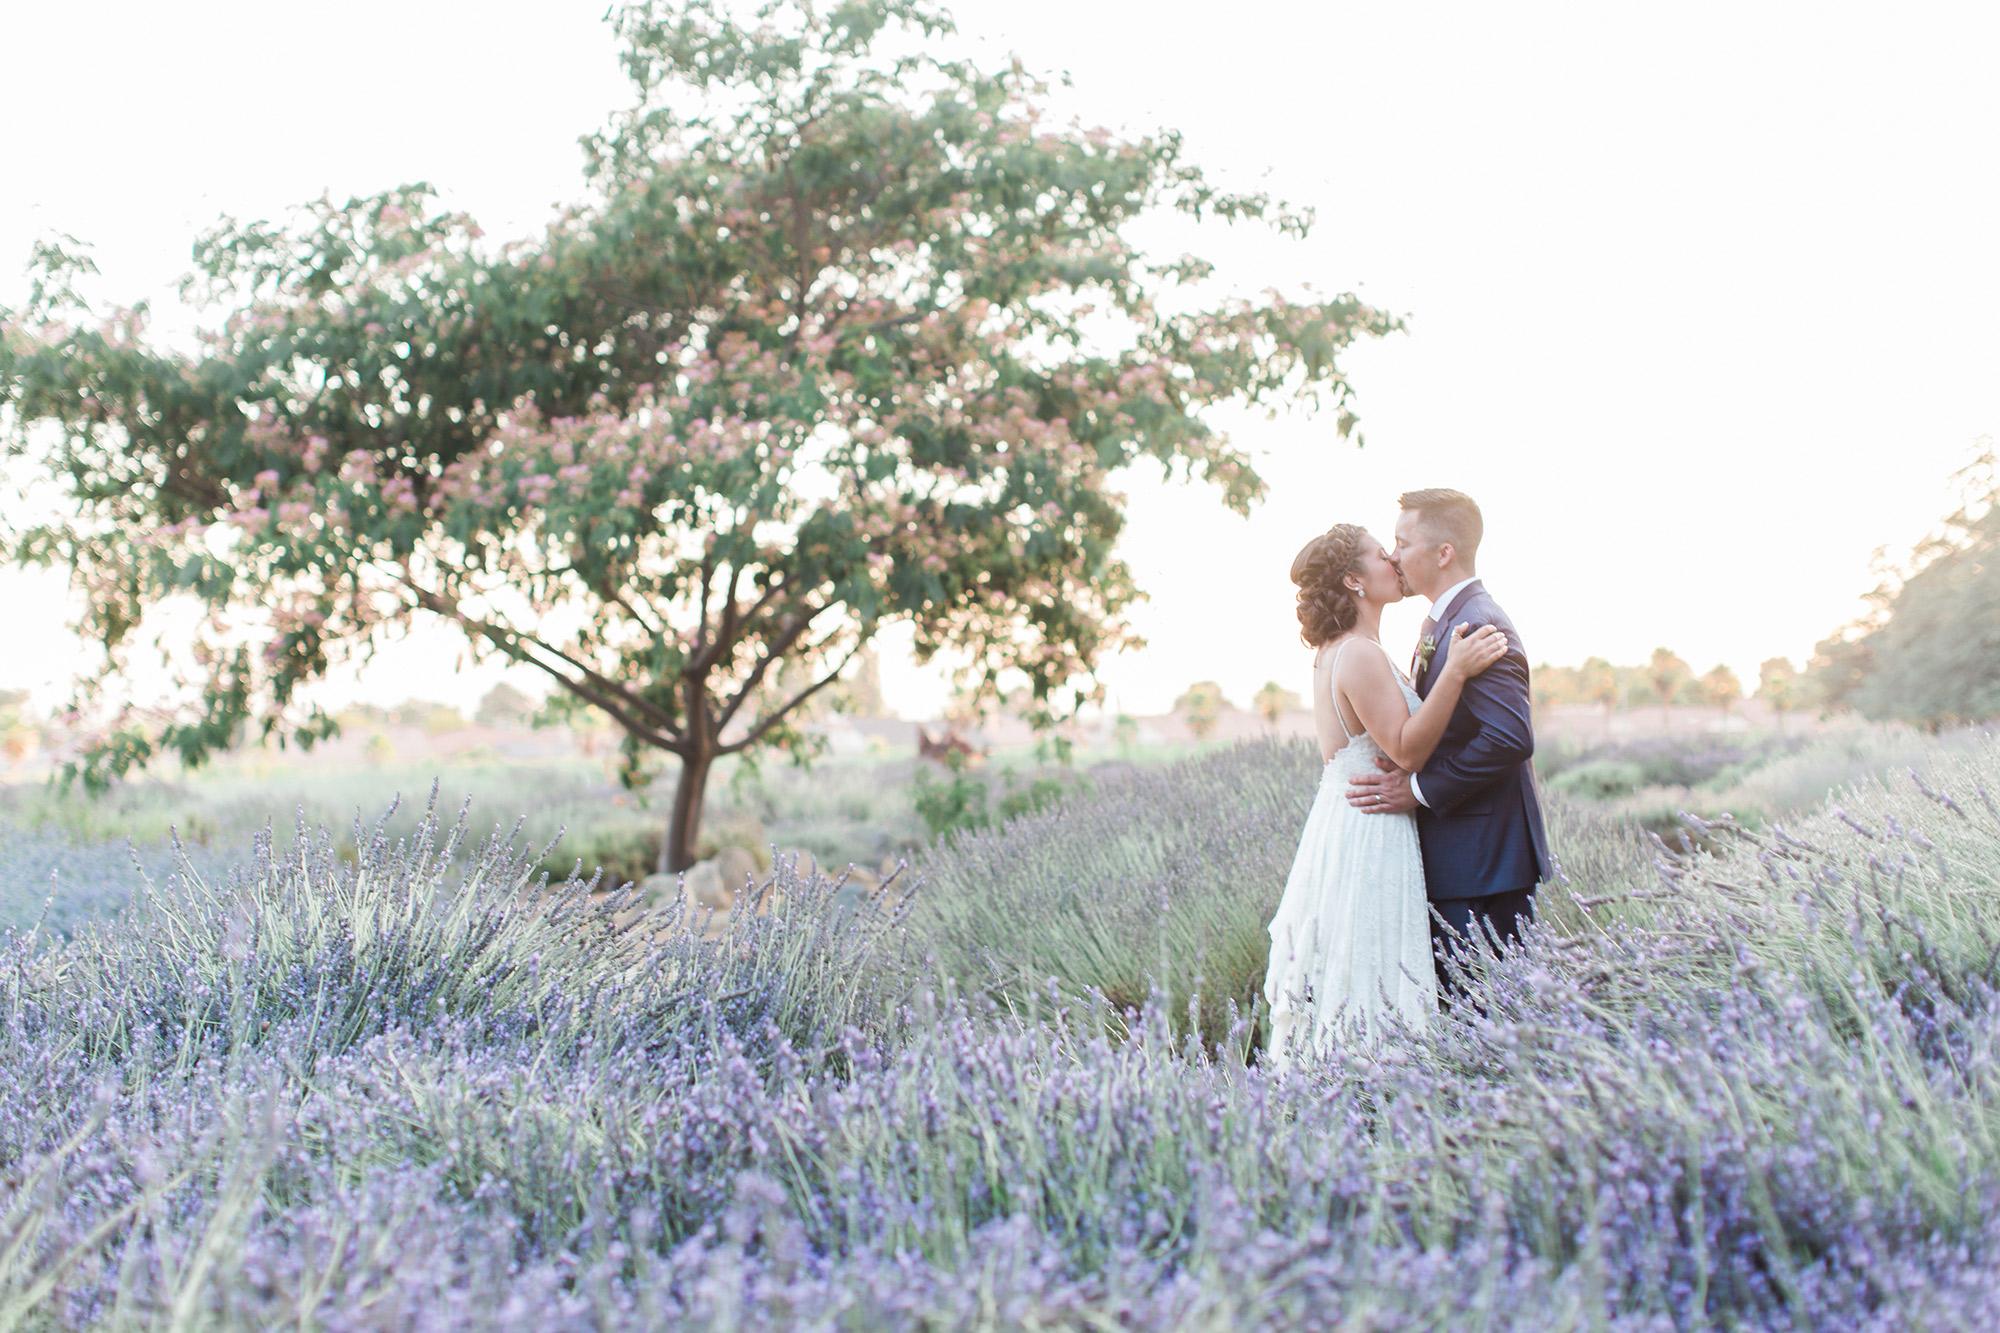 Highland Springs Resort Wedding Photographer Leah Vis 49.jpg